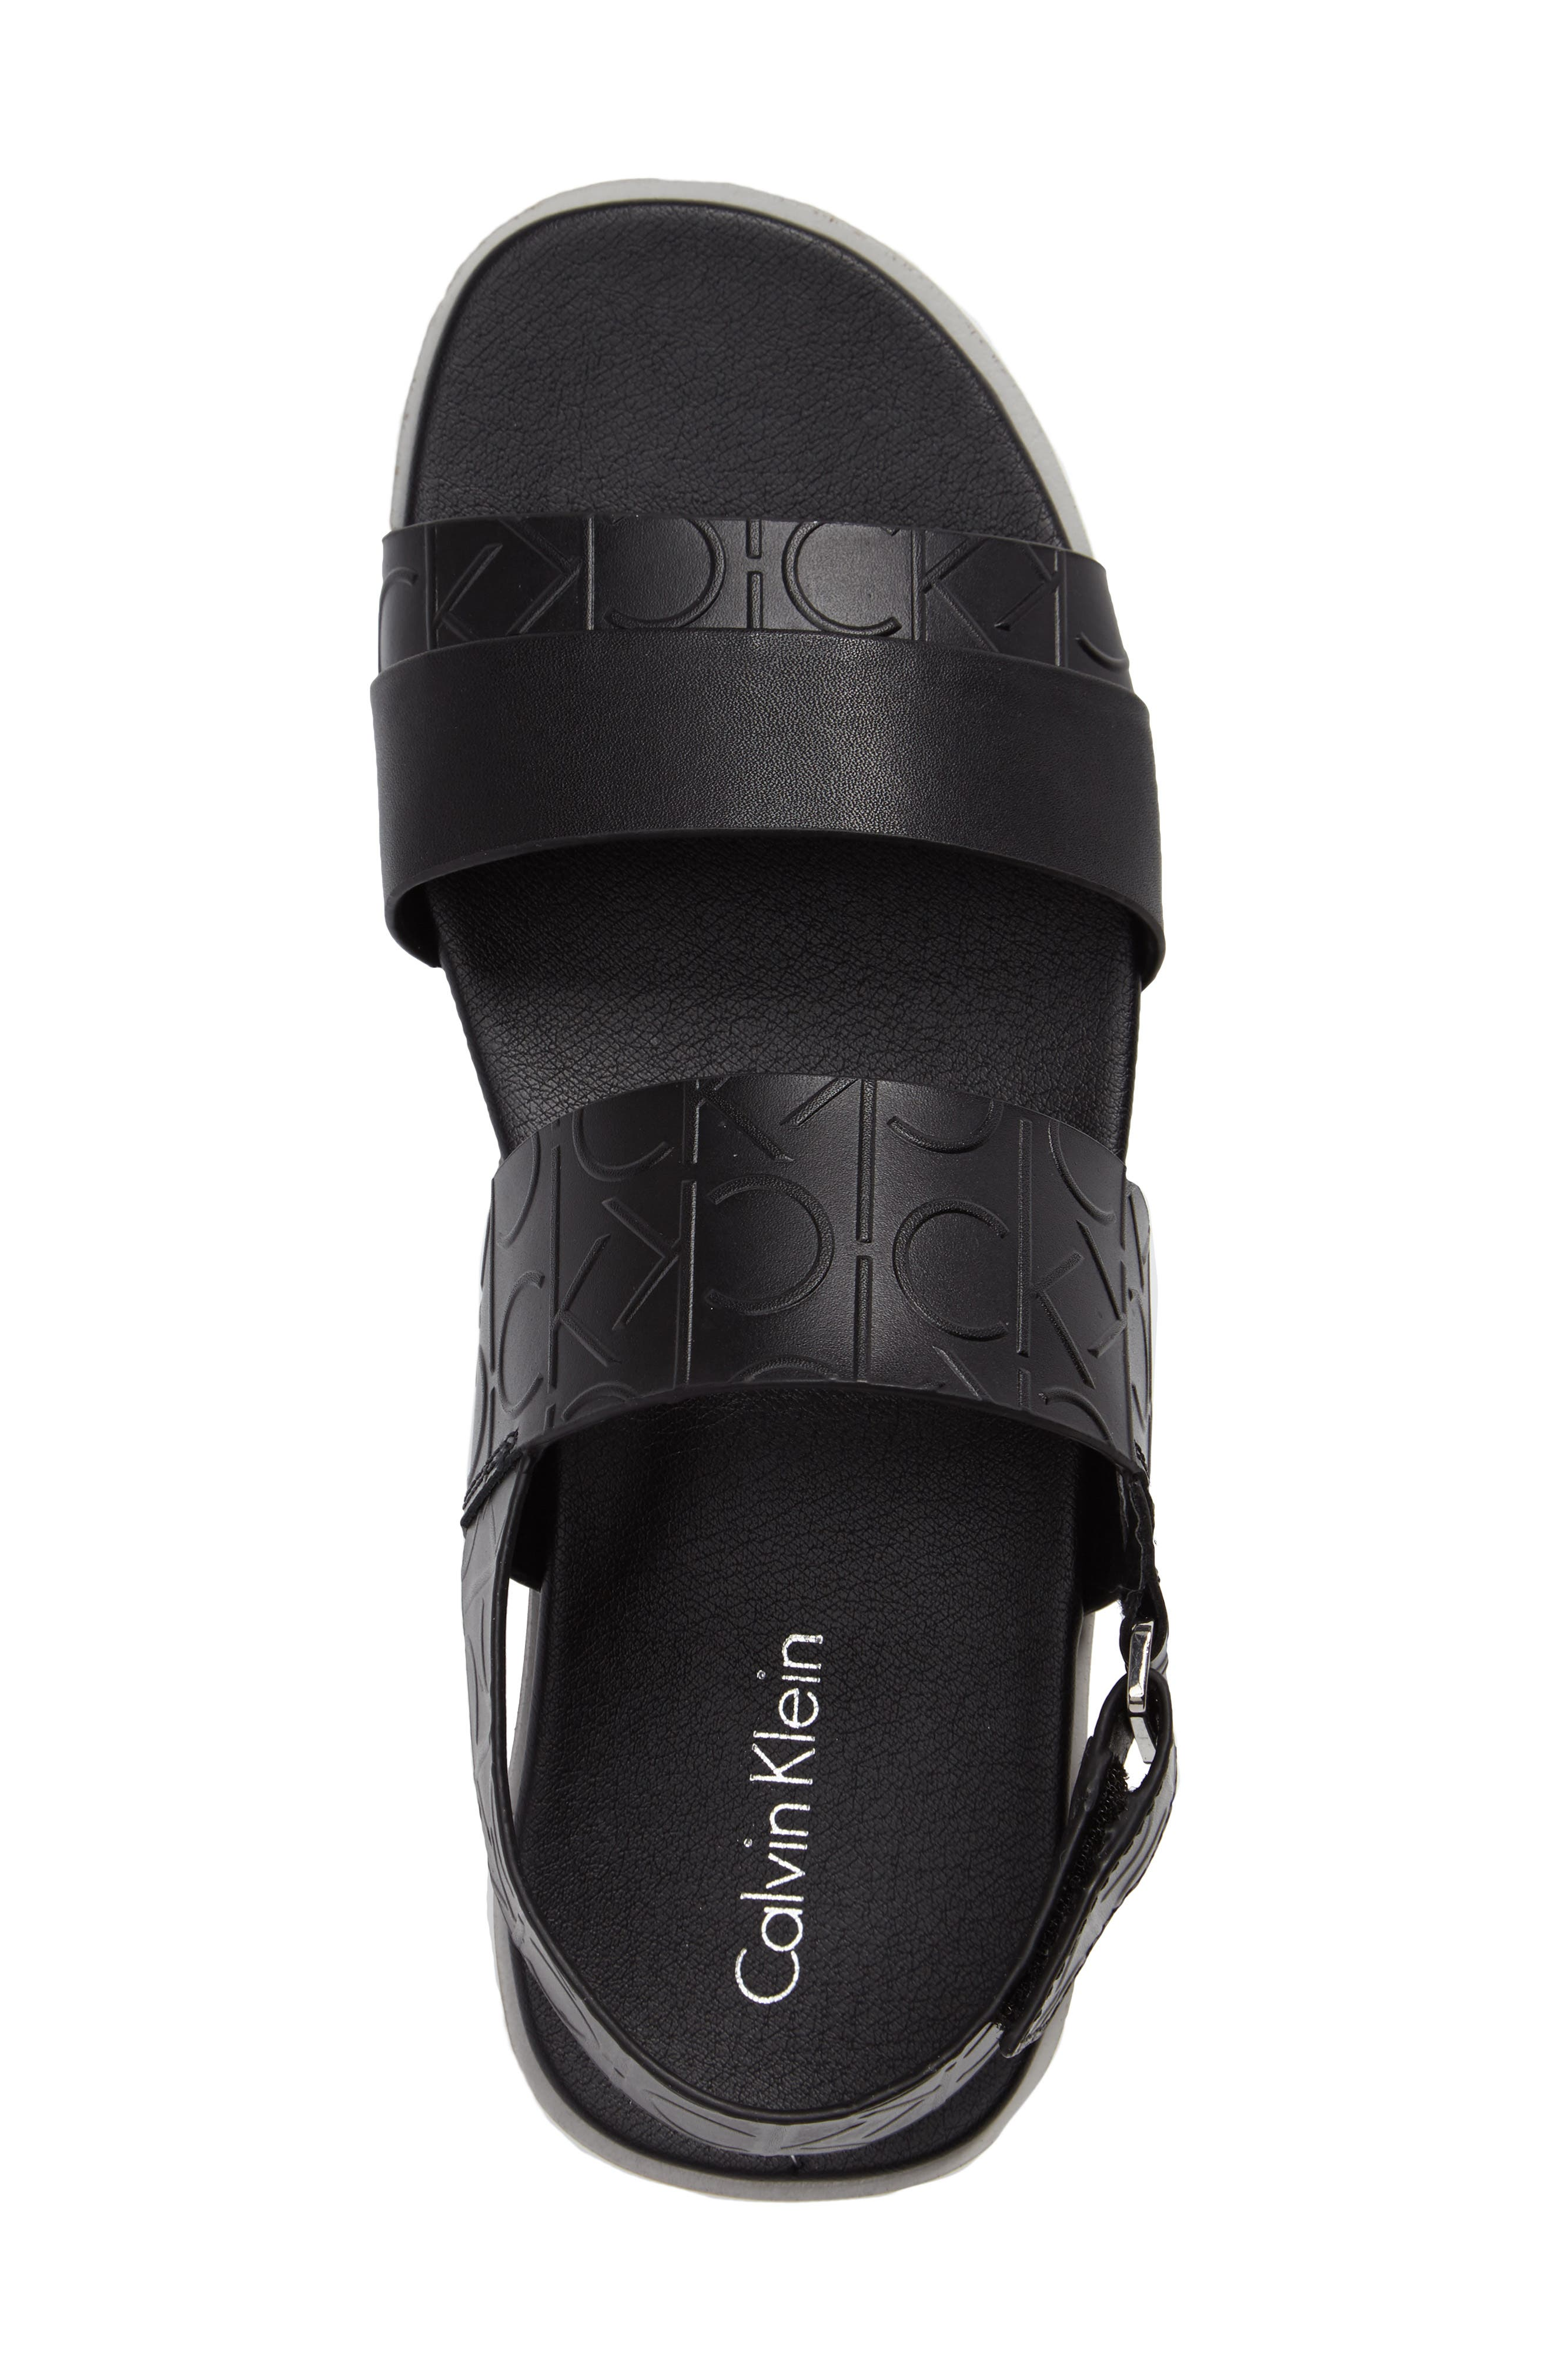 'Dex' Embossed Leather Sandal,                             Alternate thumbnail 3, color,                             Black/Black